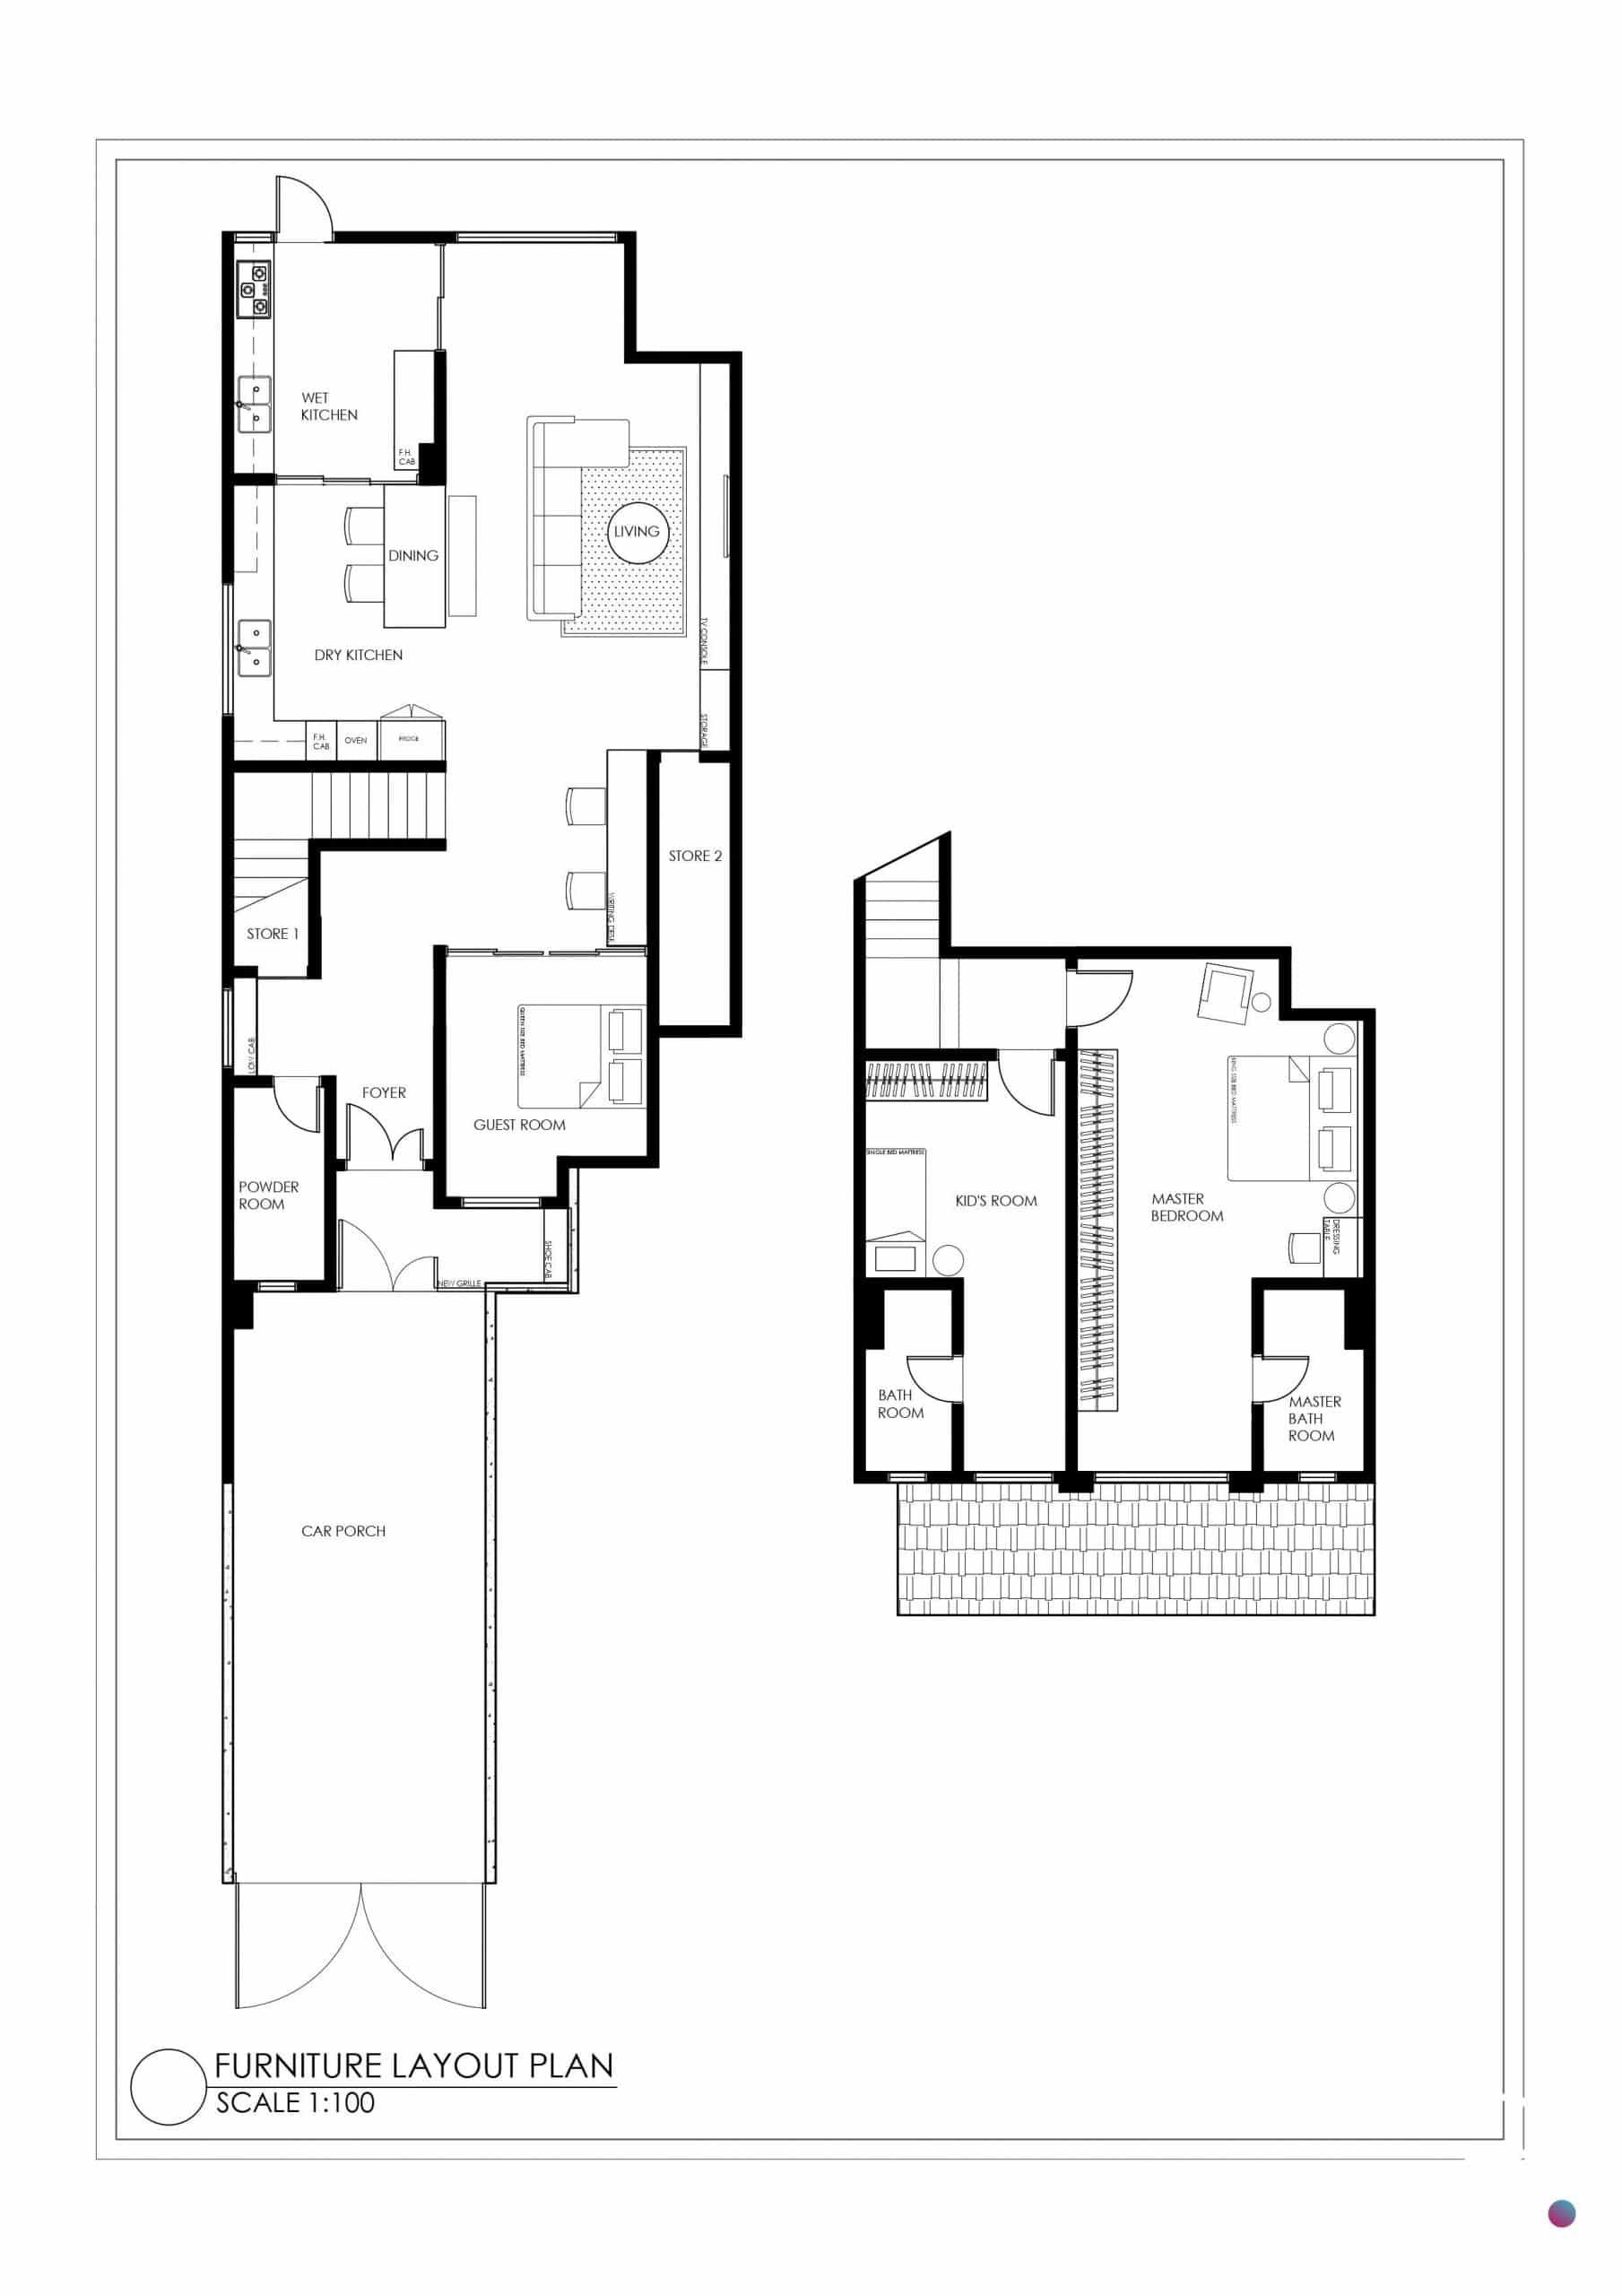 Upper-unit townhouse unit floor plan of Parkville Sunway Damansara townhouse